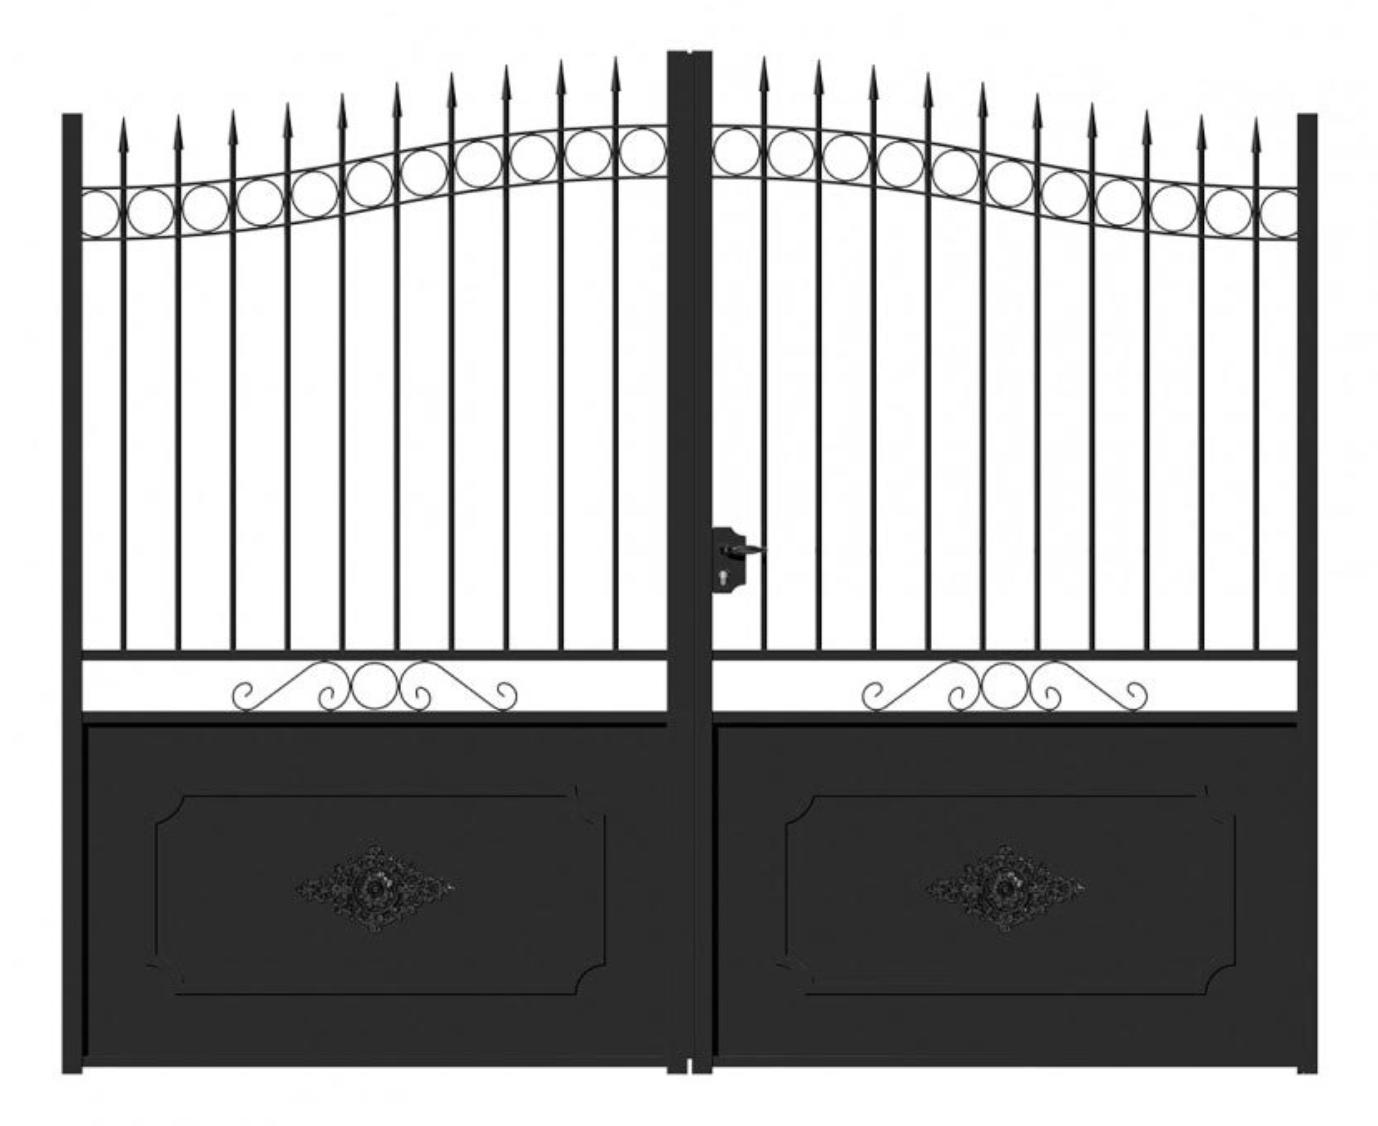 Promotion portail porte de jardin en fer forgé | Cabasvanessabruno